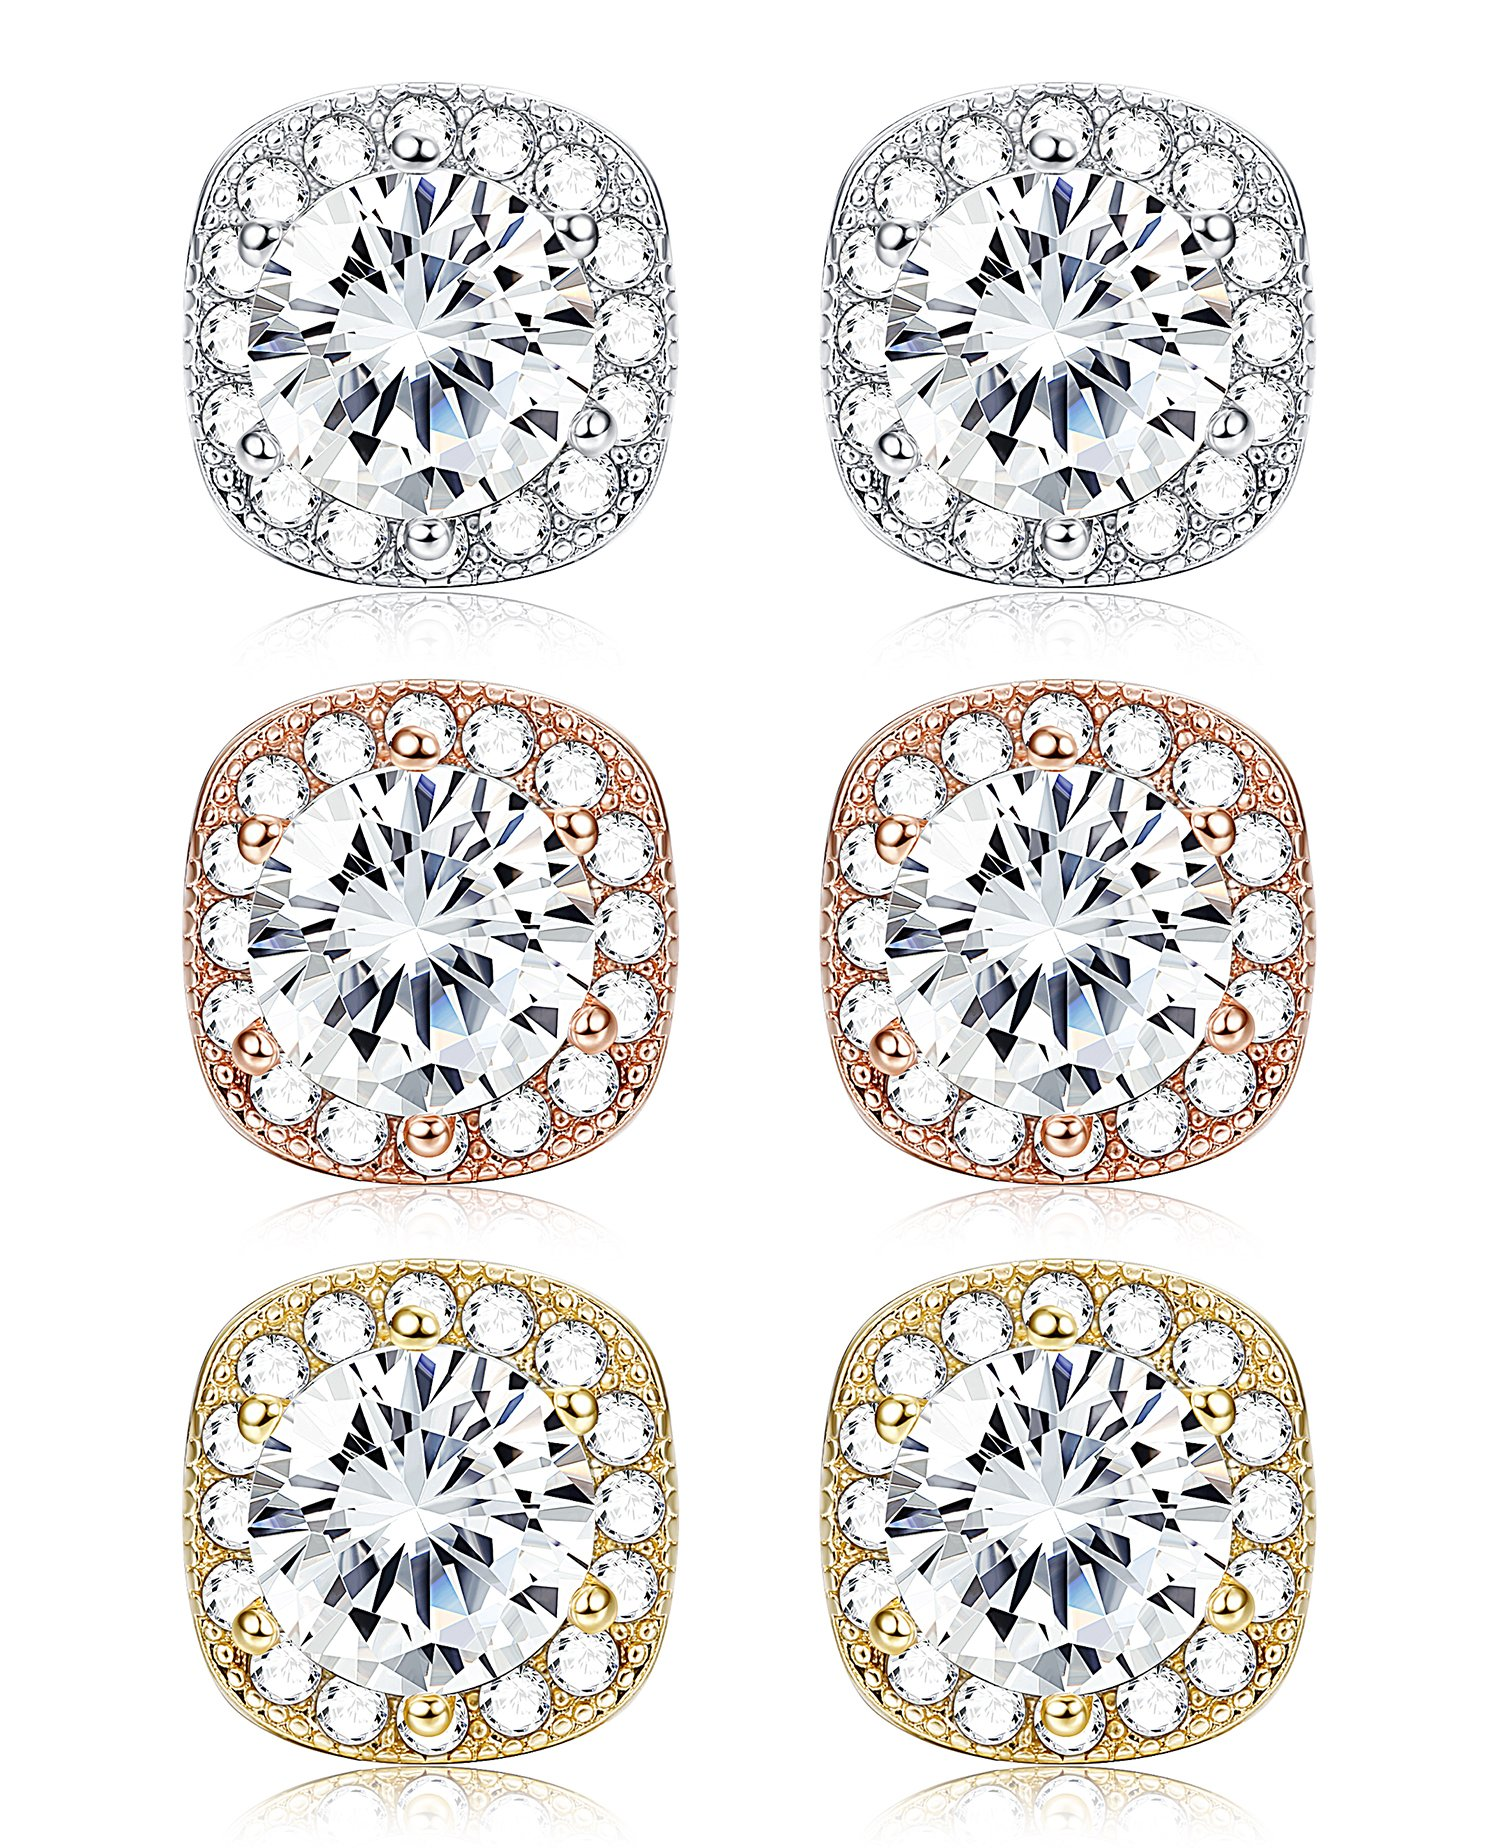 LOYALLOOK Cubic Zirconia Earrings White Gold Plated Halo Stud Earrings for Women Stud Earrings set